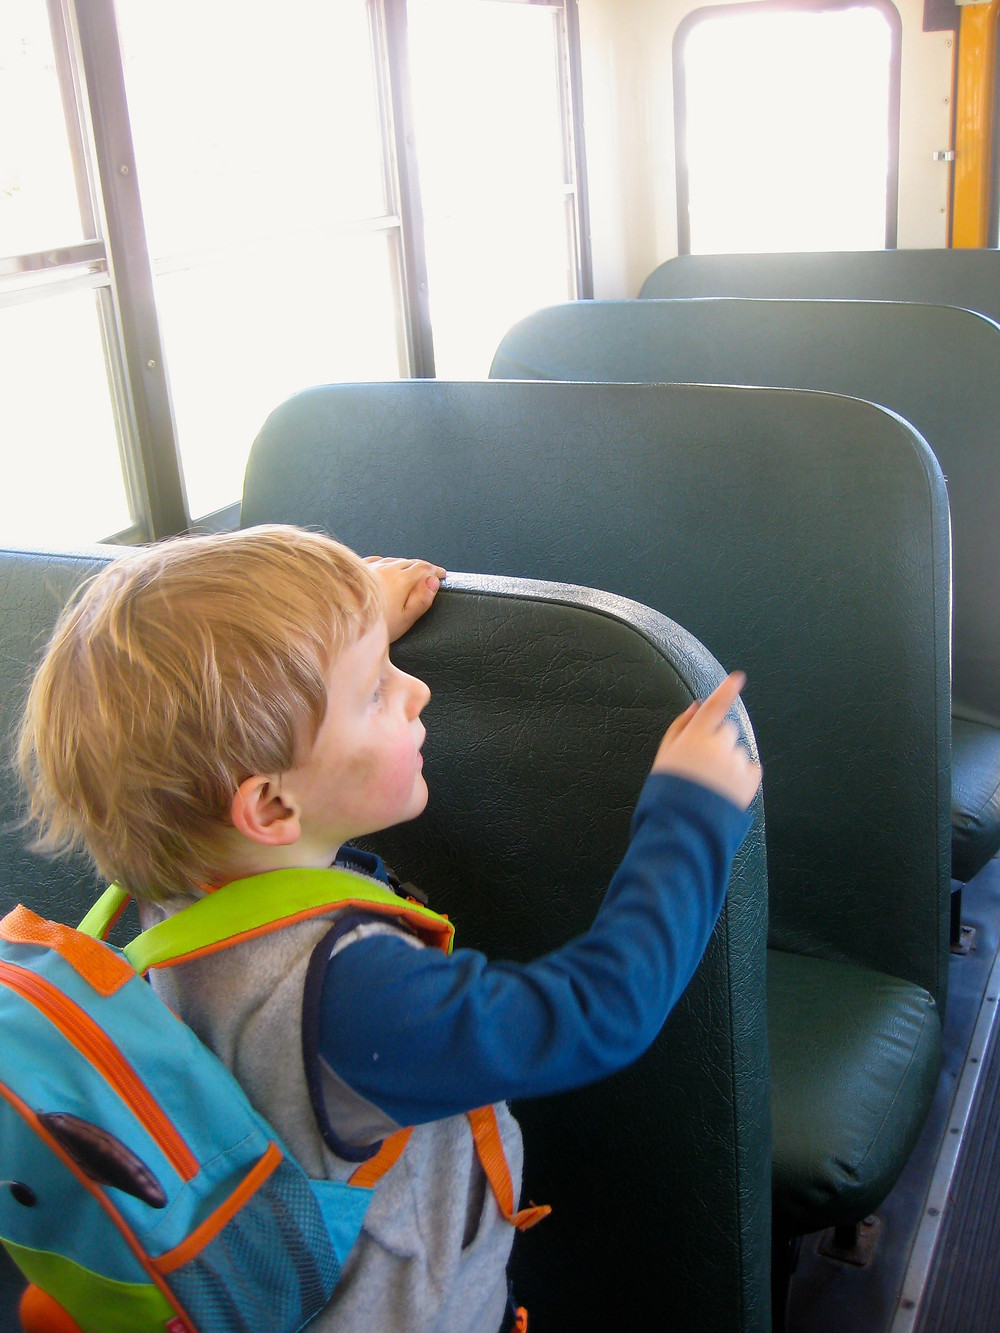 5-2-15 11Tristan on bus.jpg